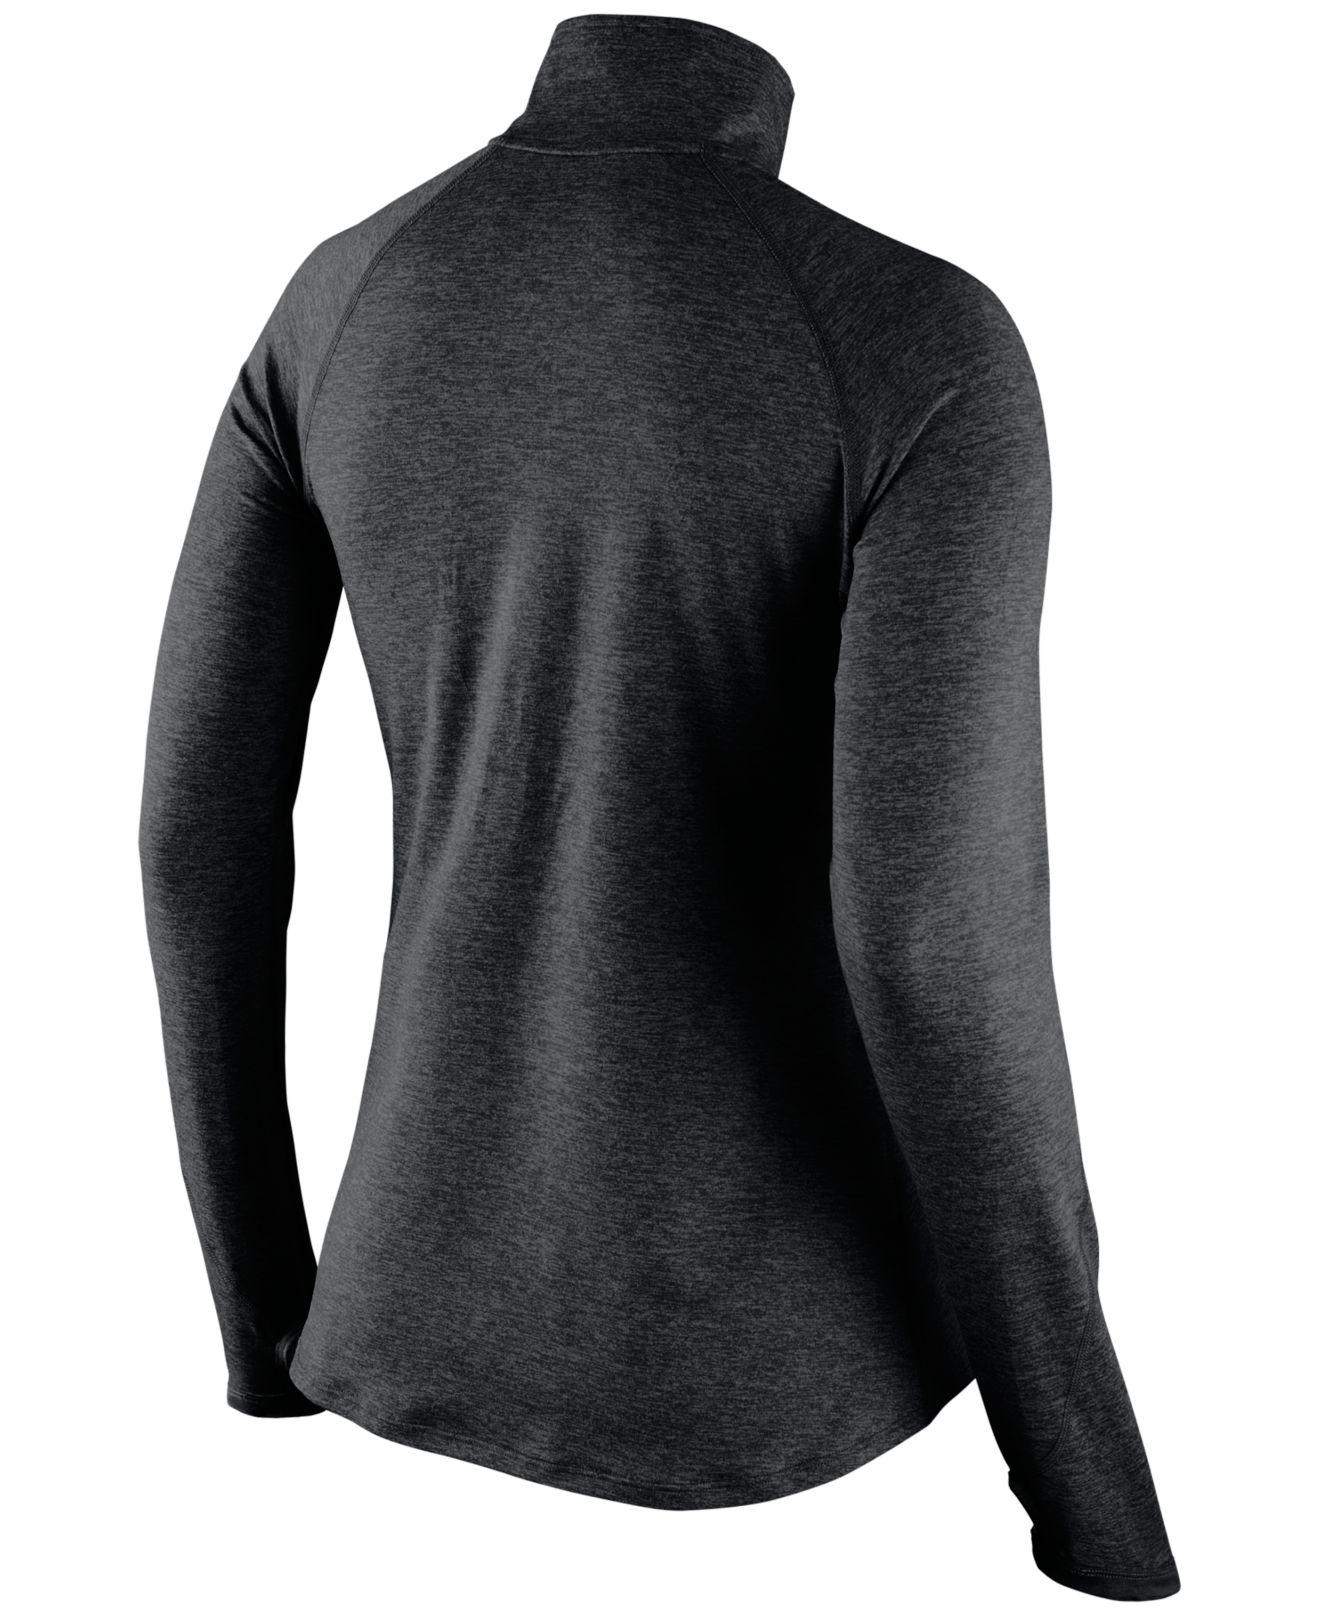 nike quarter zip pullover. gallery nike quarter zip pullover